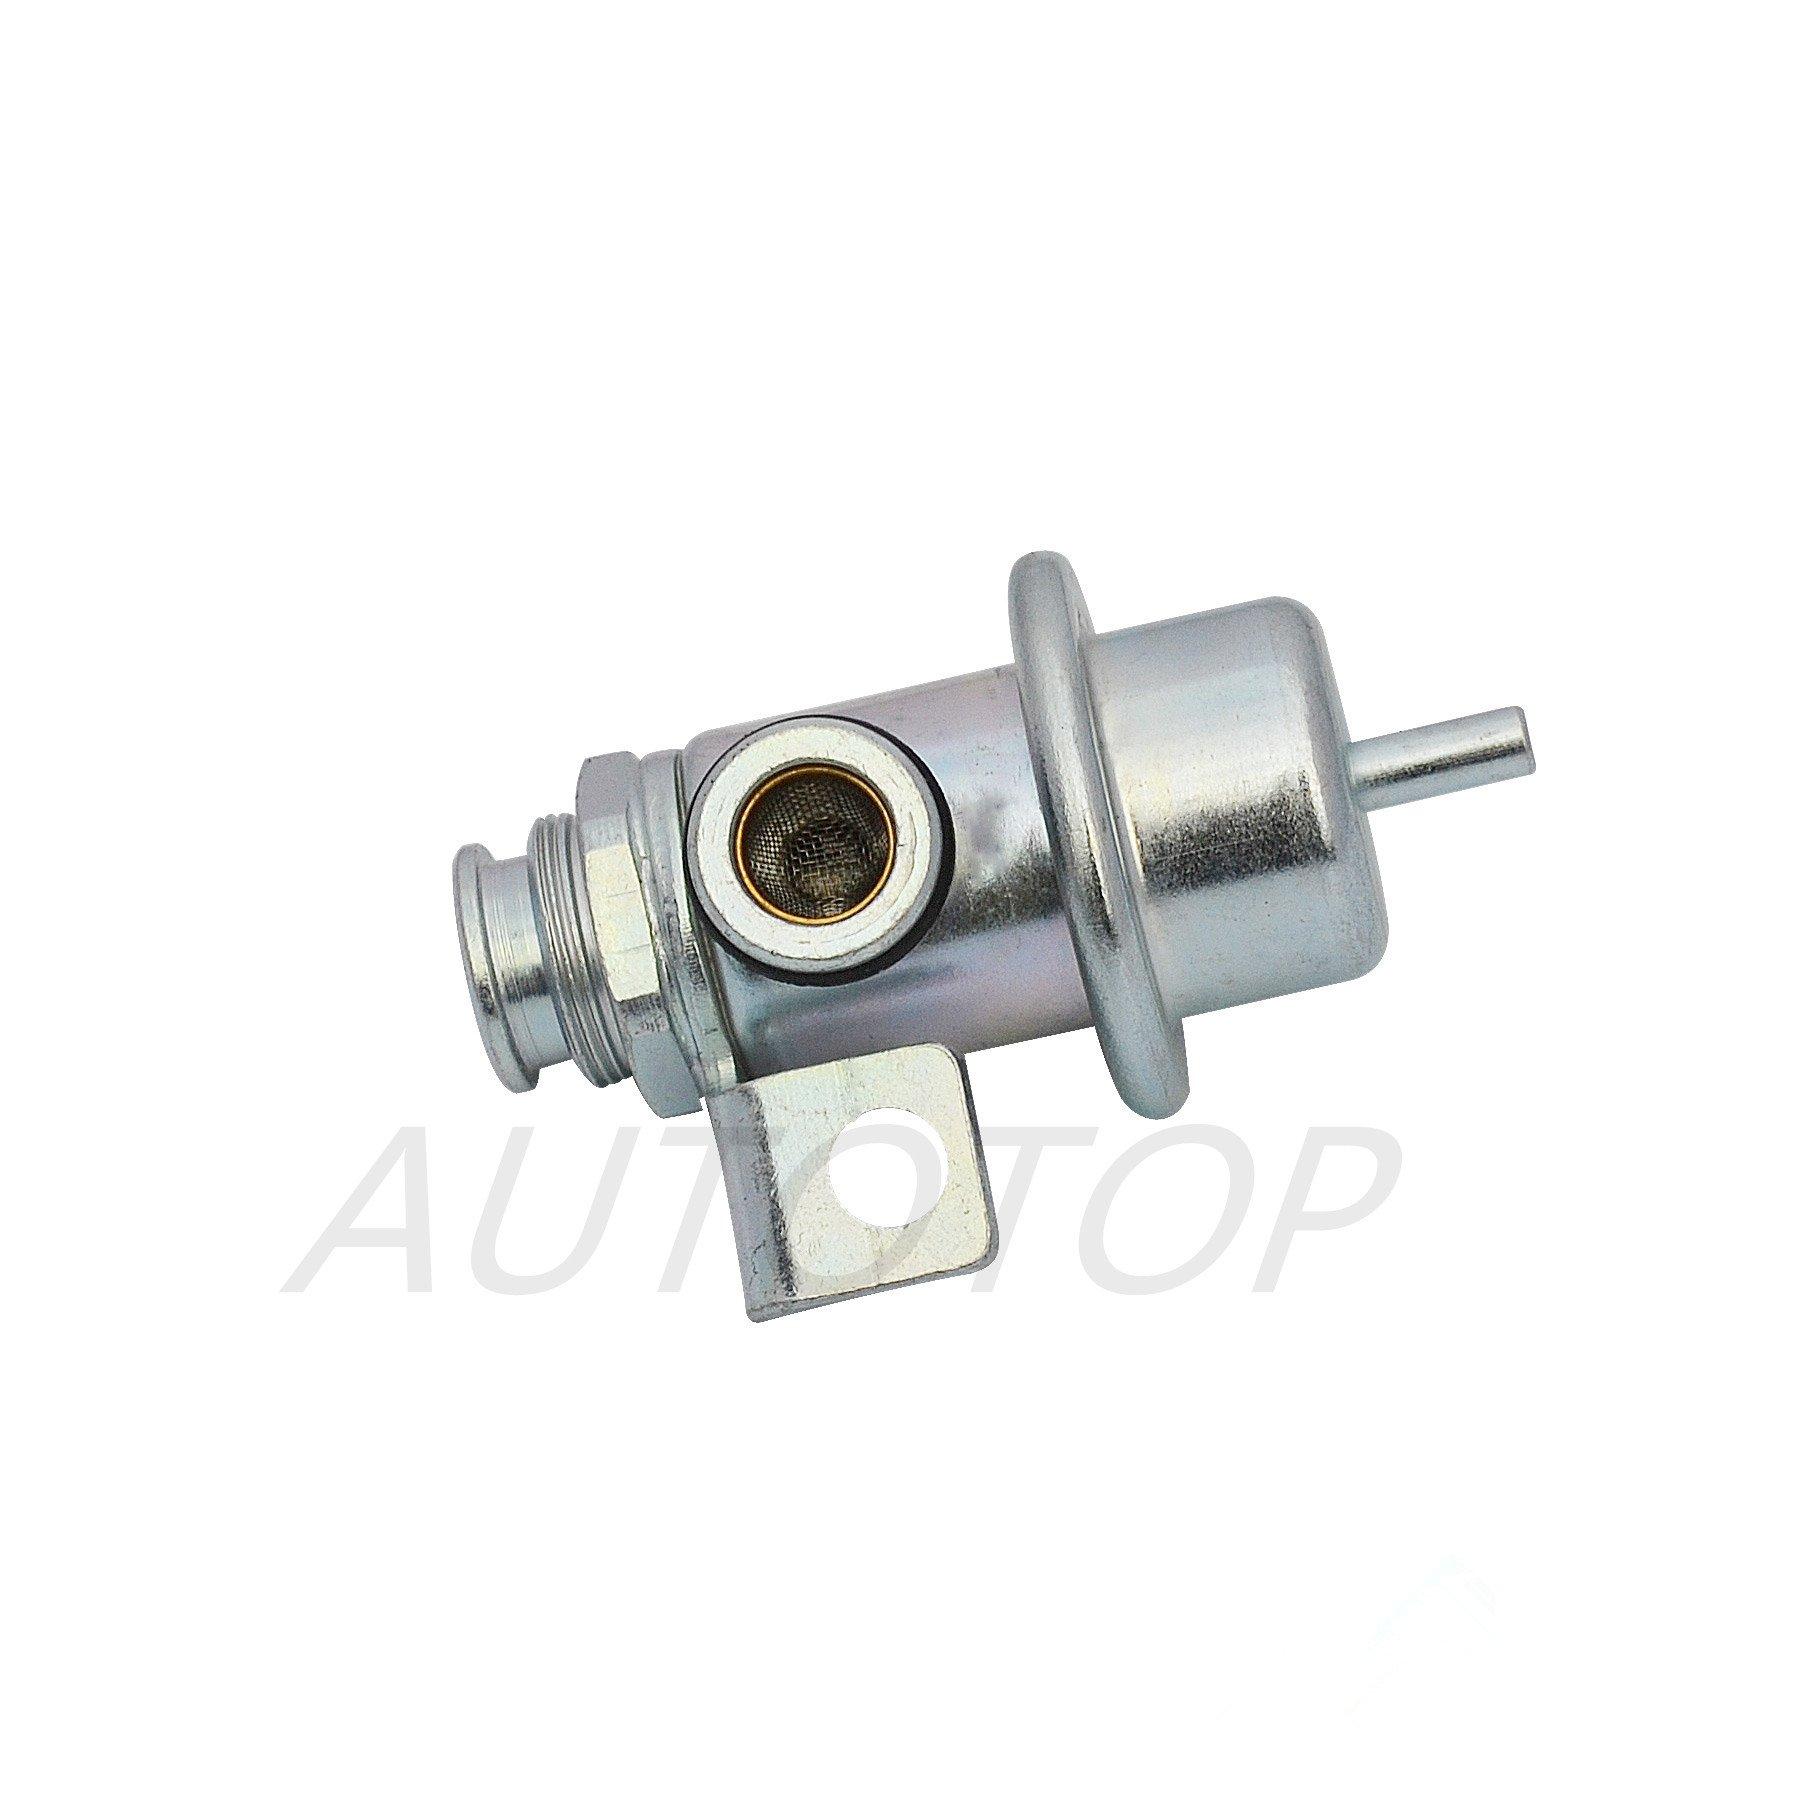 PR234 PR143 Fuel Injection Pressure Regulator Fit Buick Pontiac Chevrolet Oldsmobile17113622 2000~2005